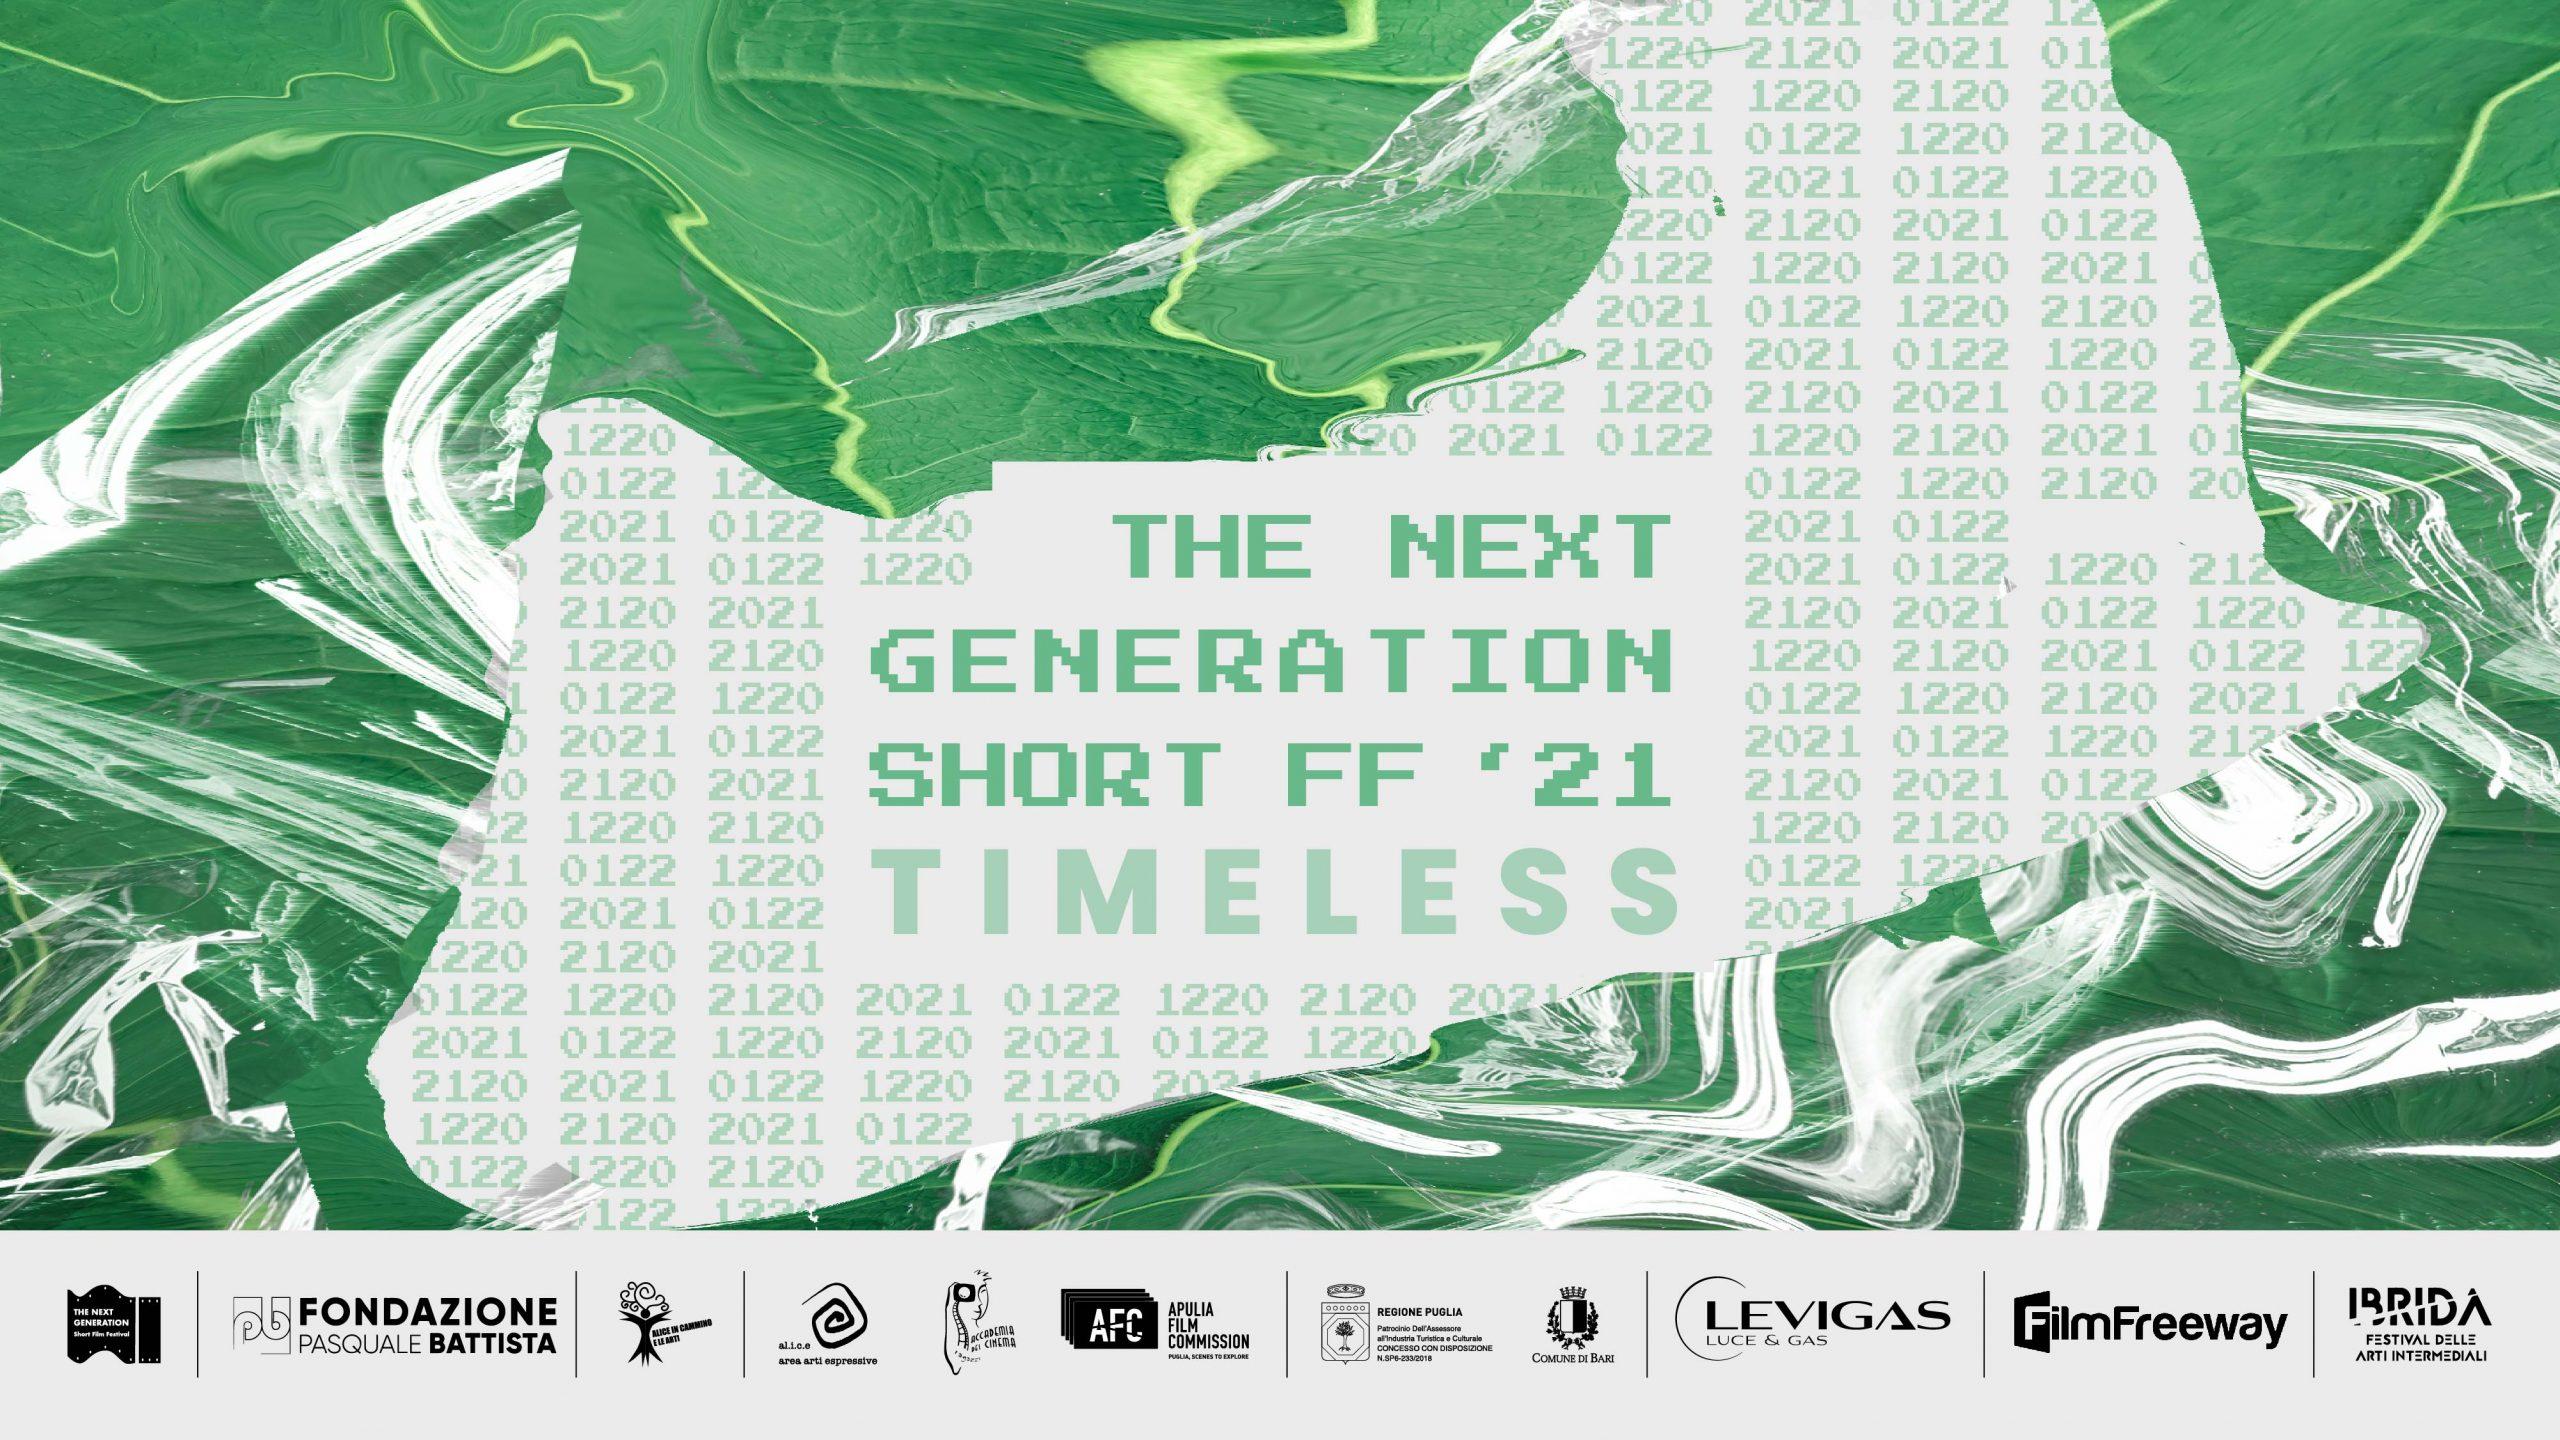 The Next Generation Short Film Festival 2021